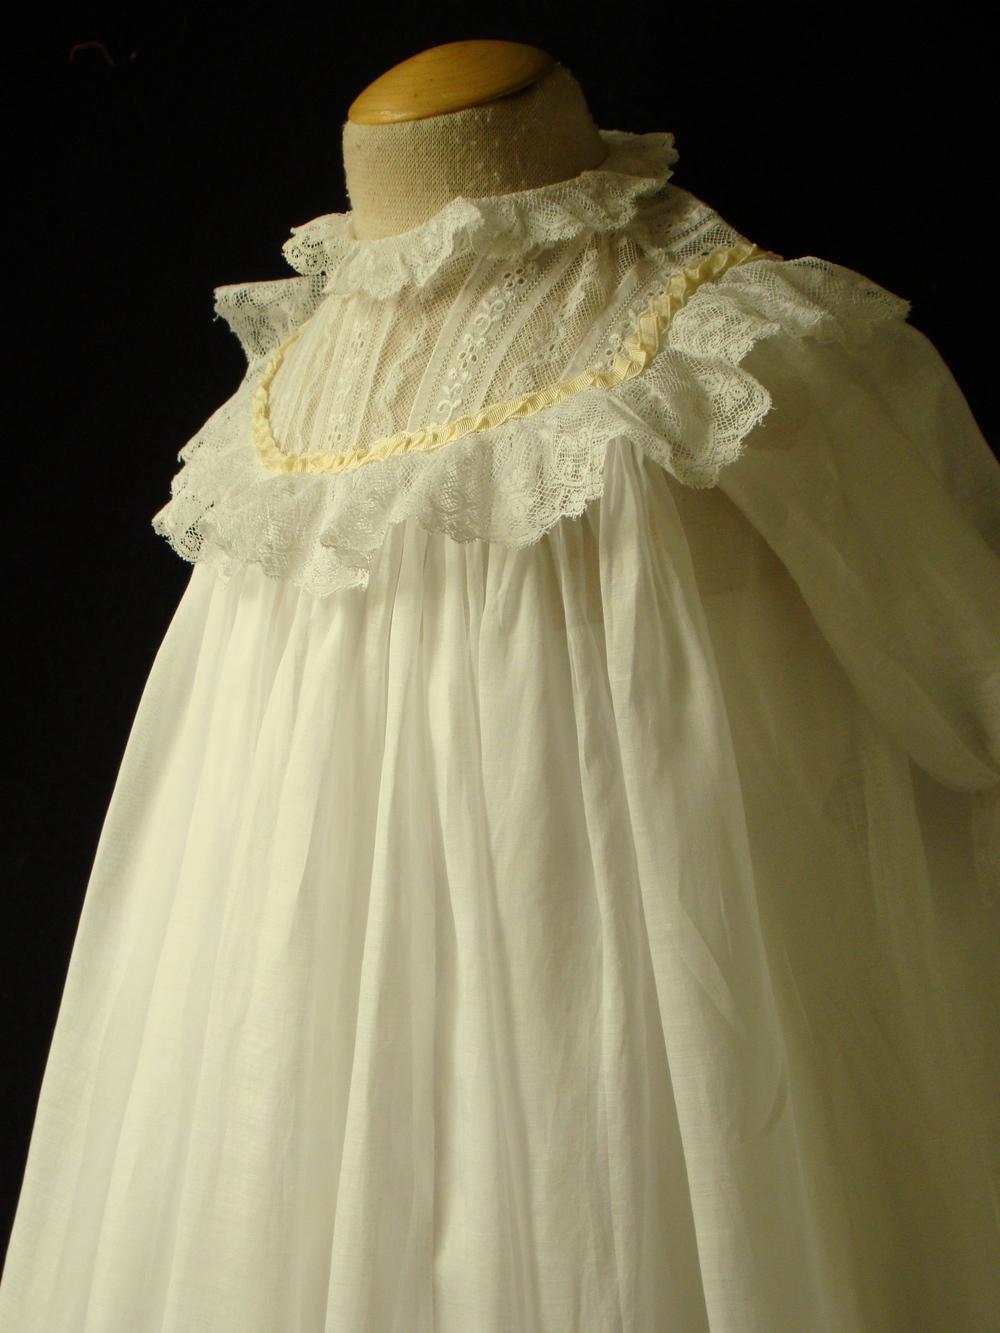 gowns3 018.JPG